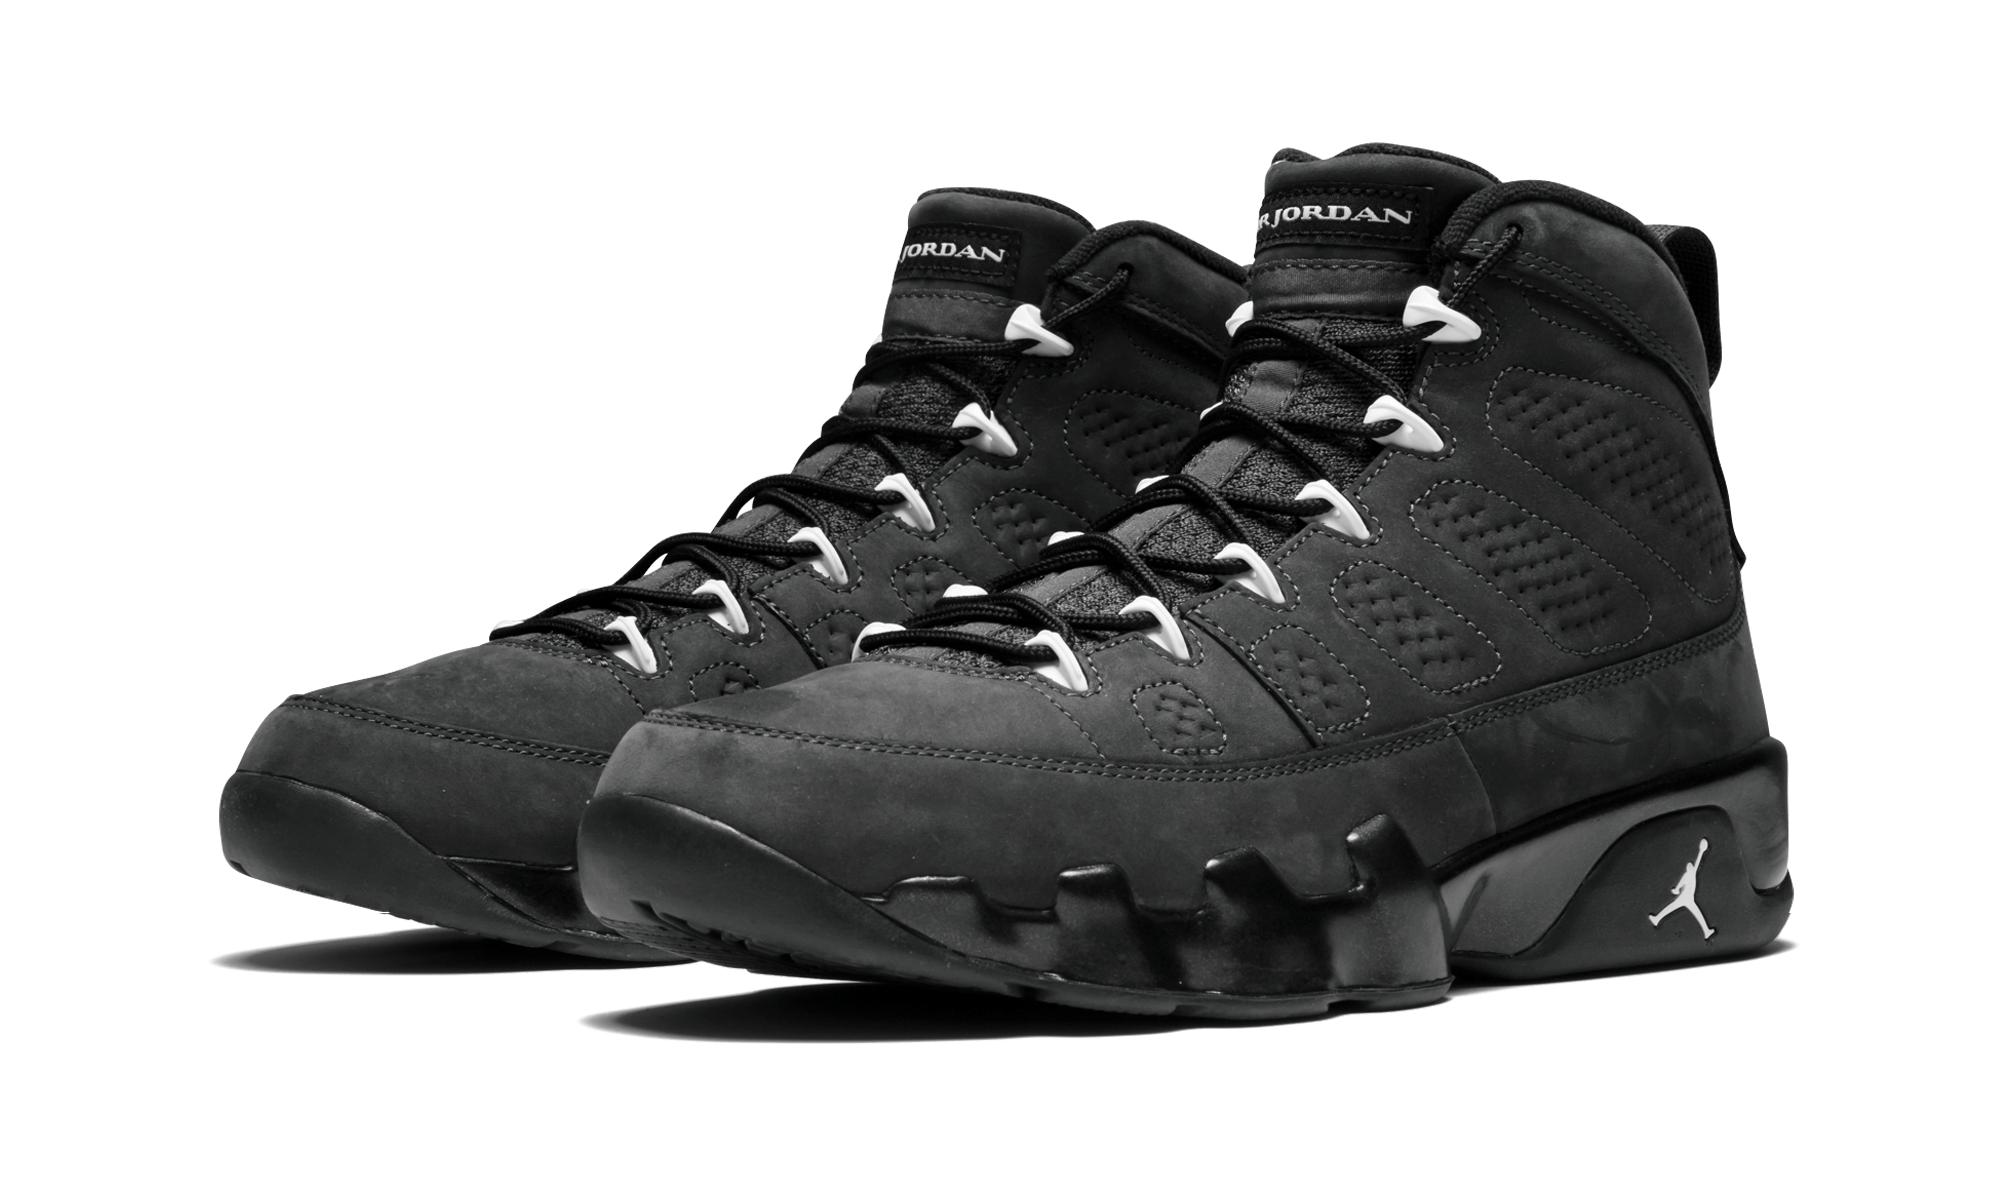 hot sale online 8b760 969bb Nike - Black Air 9 Retro for Men - Lyst. View fullscreen